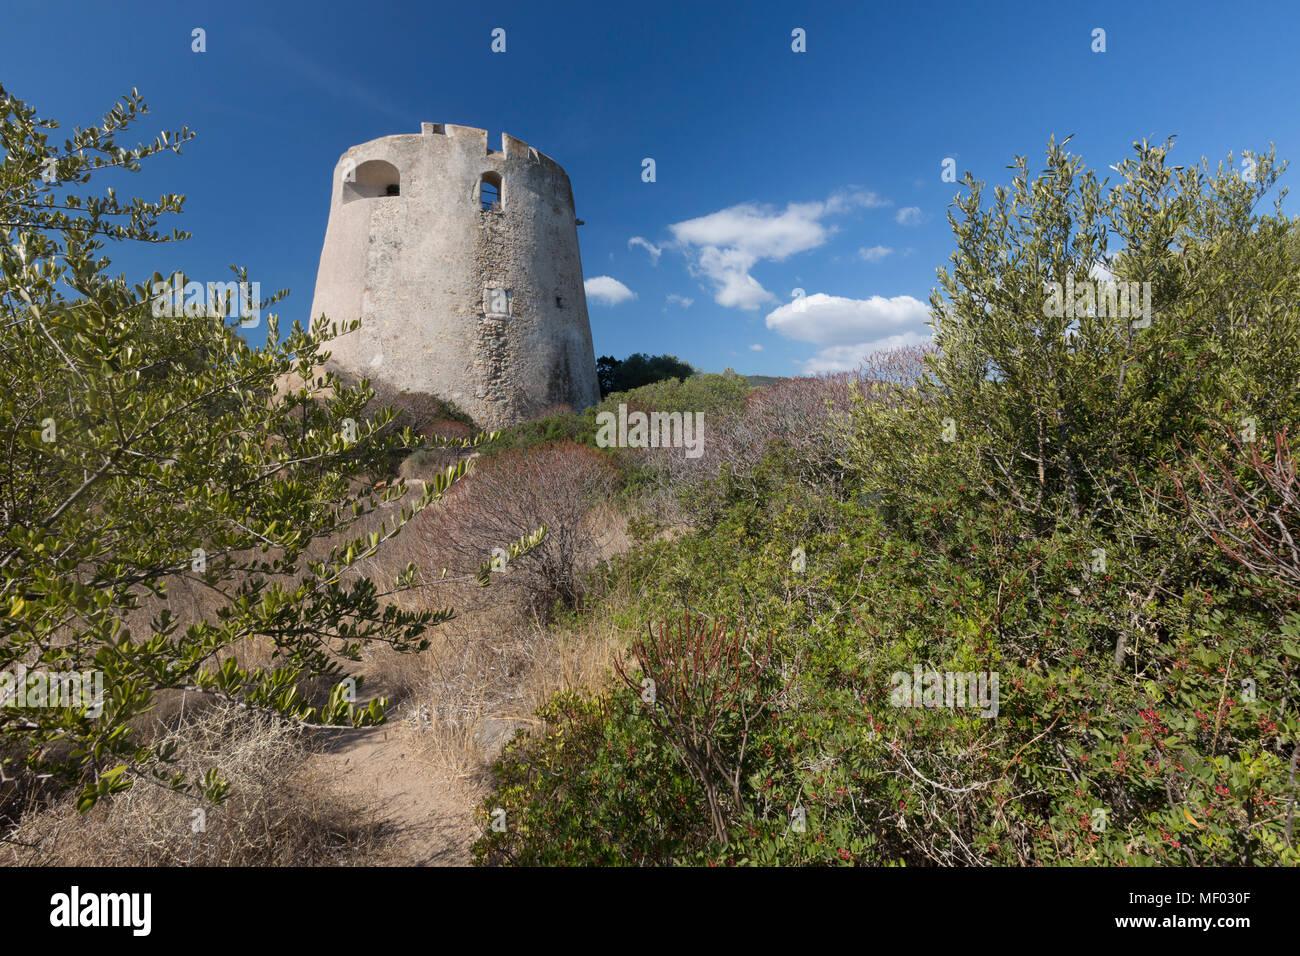 The vegetation of inland surrounds the tower Cala Pira Castiadas Cagliari Sardinia Italy Europe - Stock Image